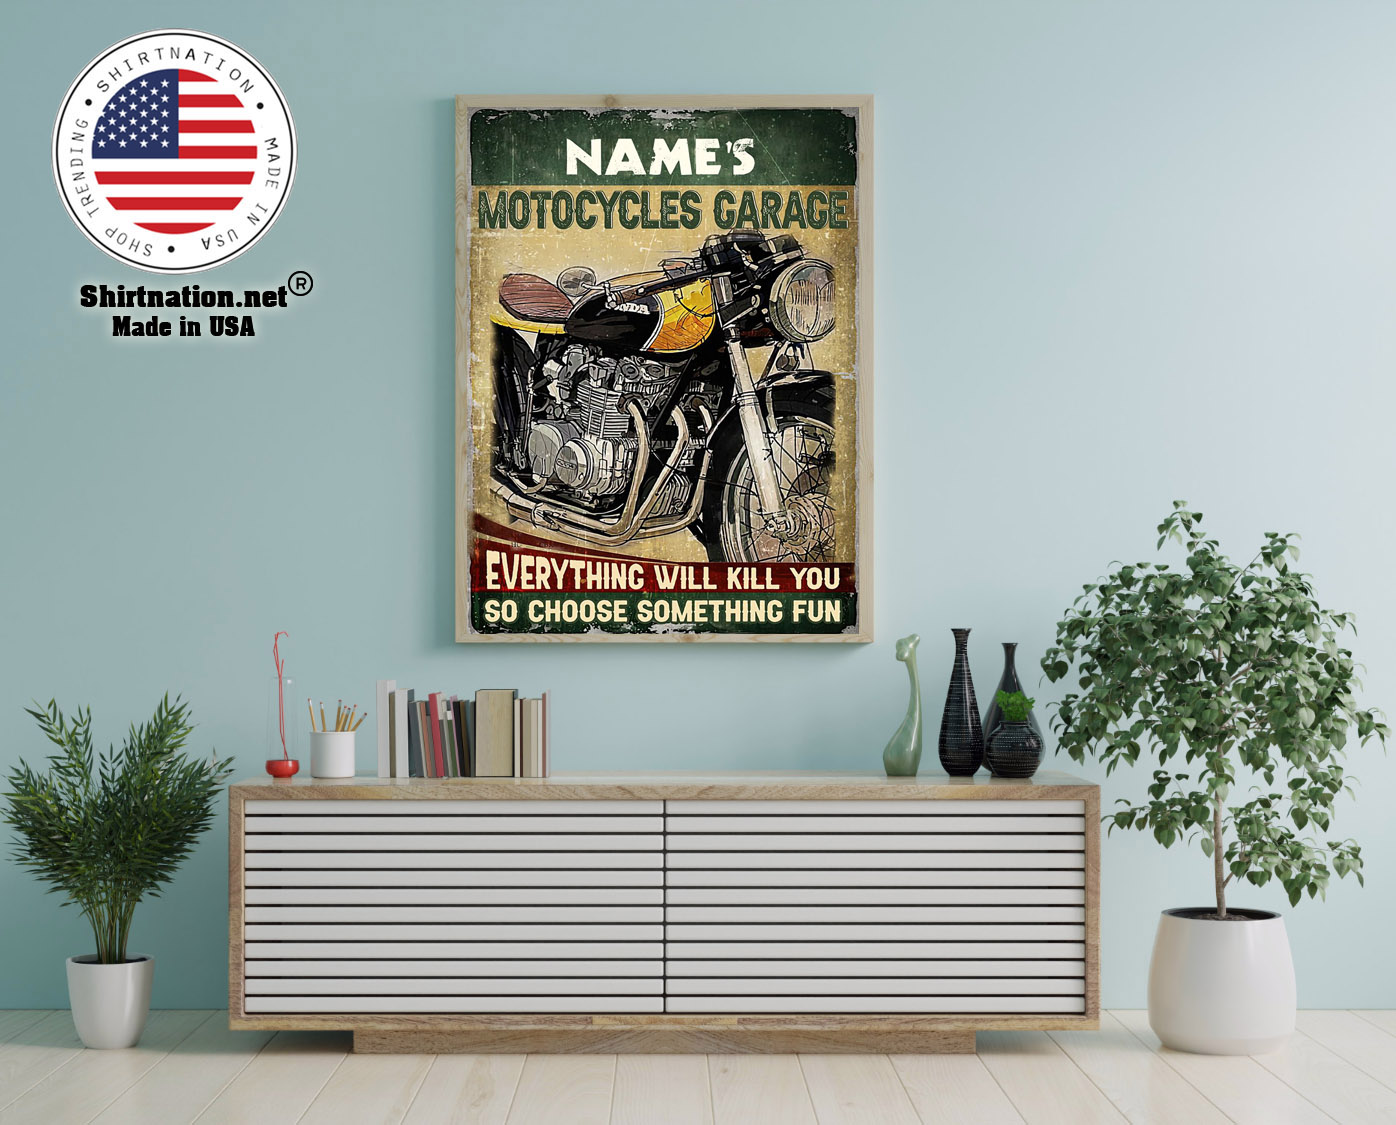 Motocycles garage eveyrthing will kill you so choose something fun custom name poster 12